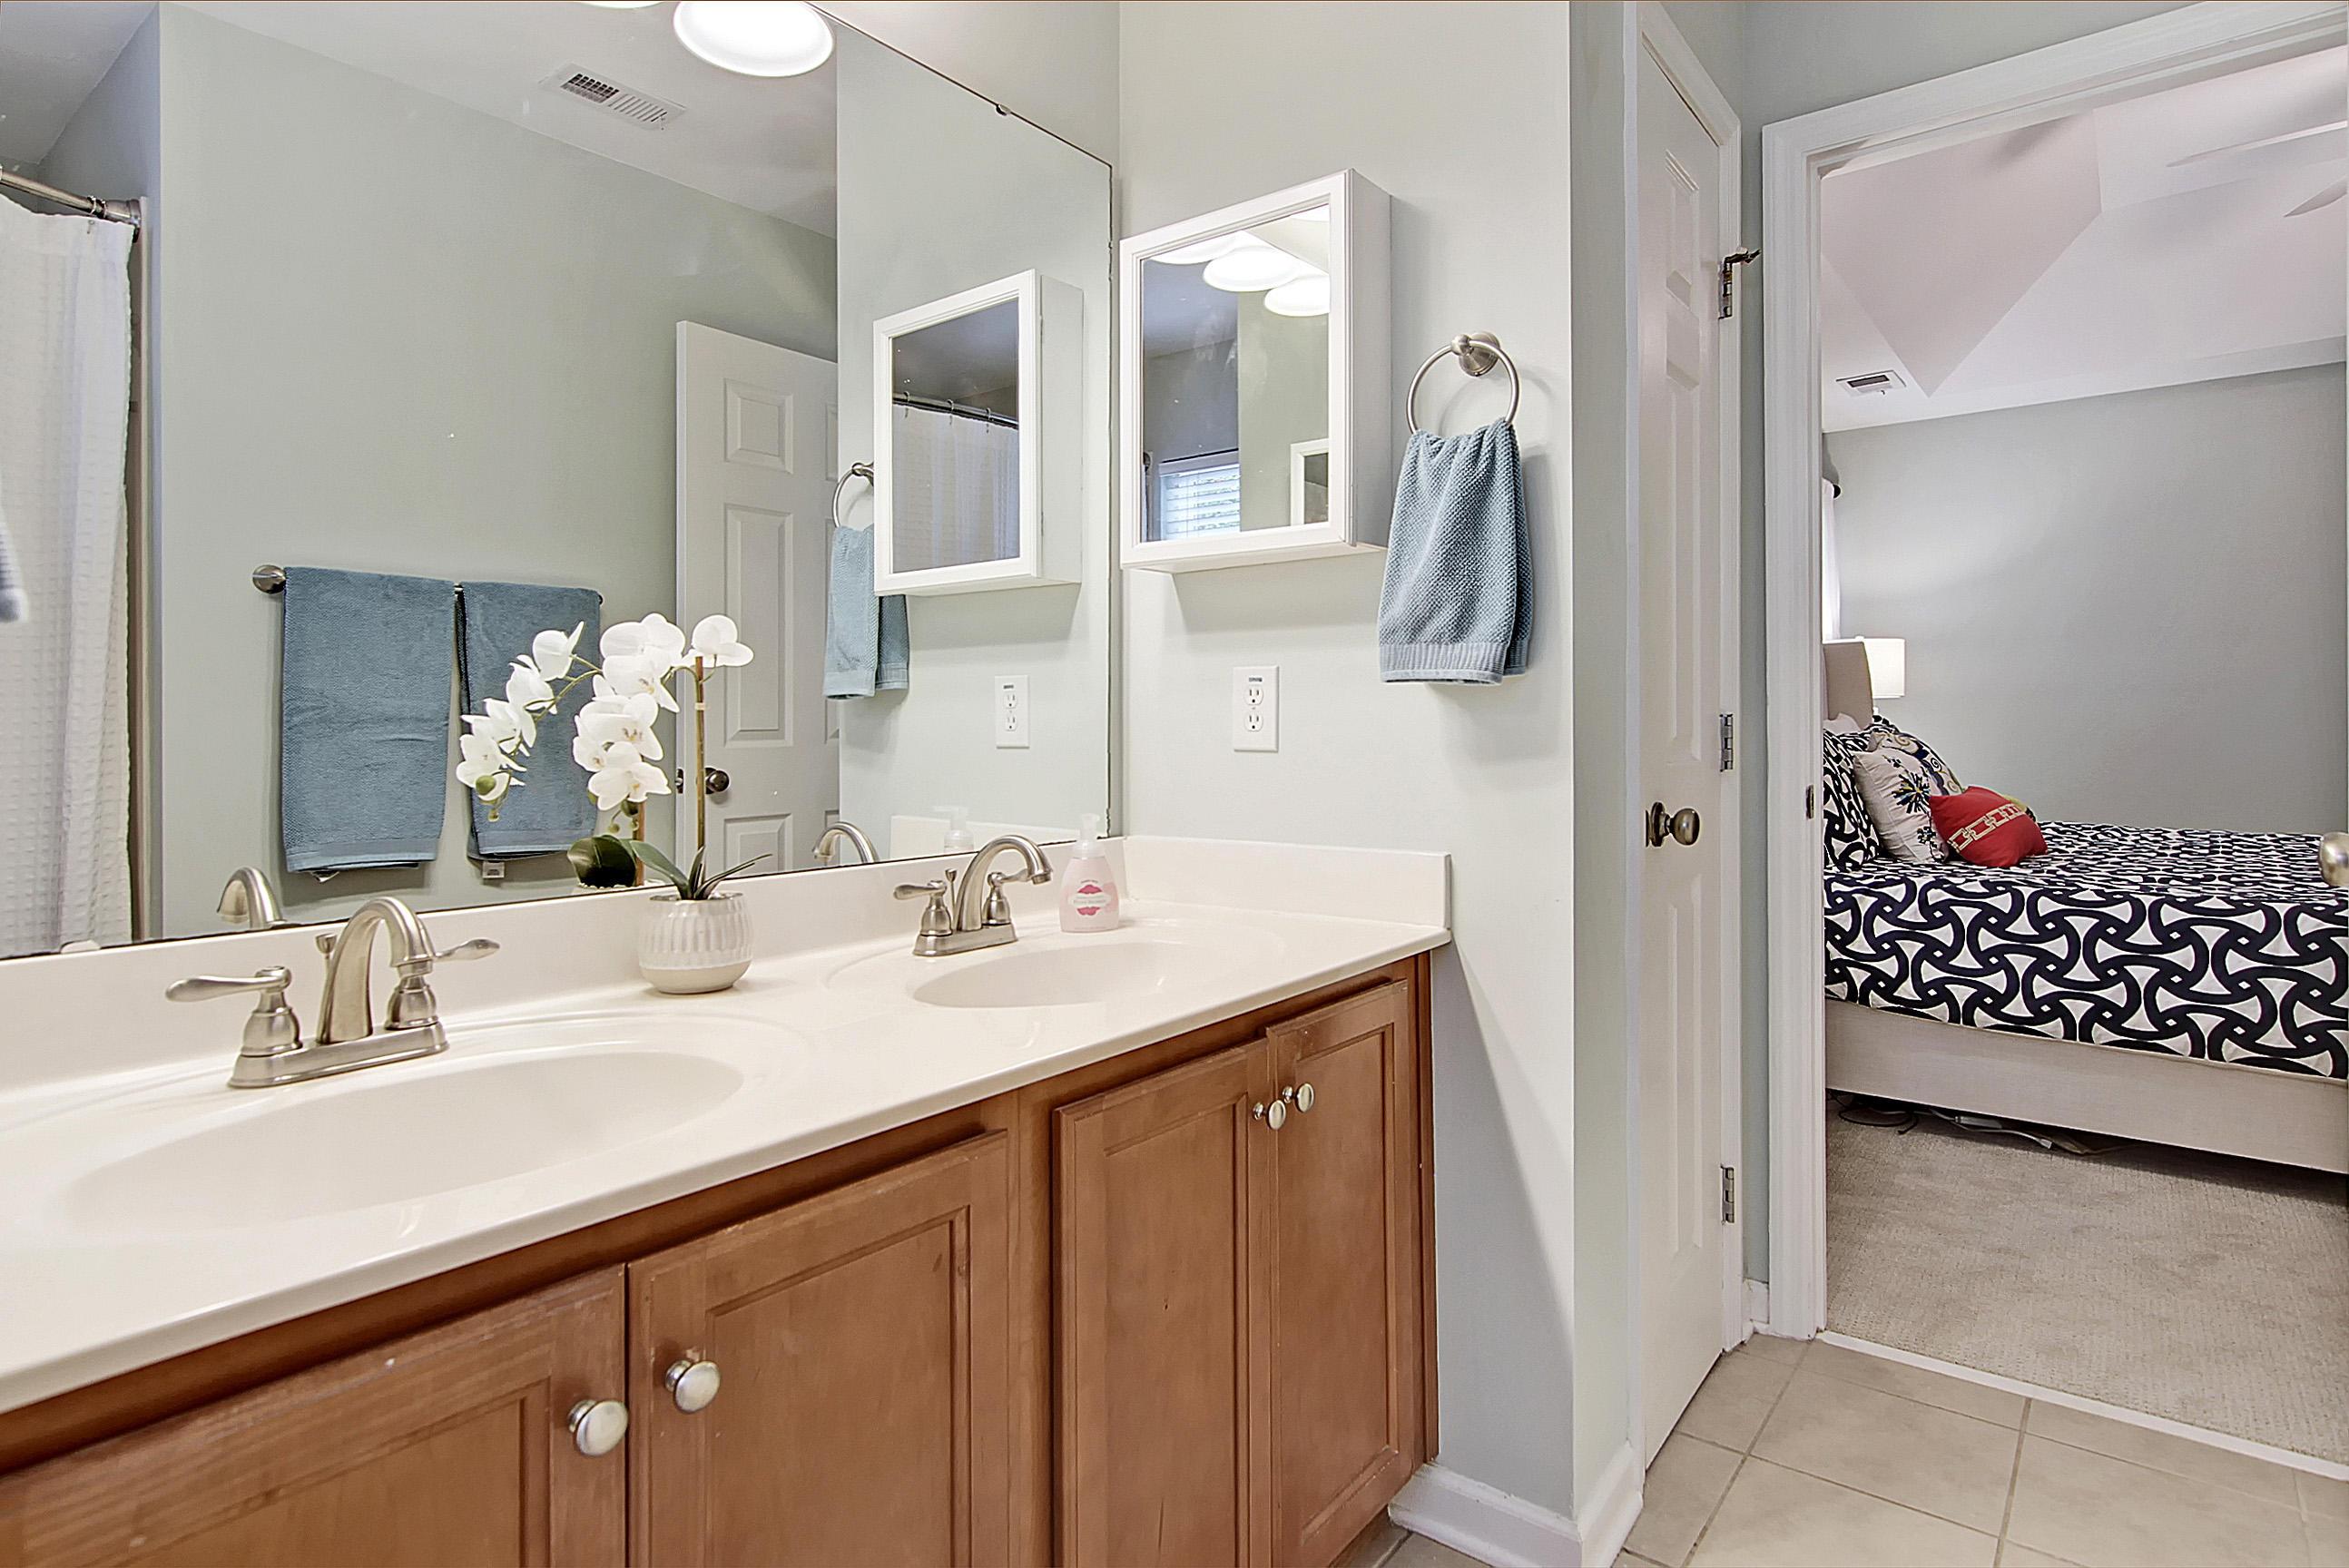 Laurel Grove Homes For Sale - 1423 Whispering Oak, Mount Pleasant, SC - 13